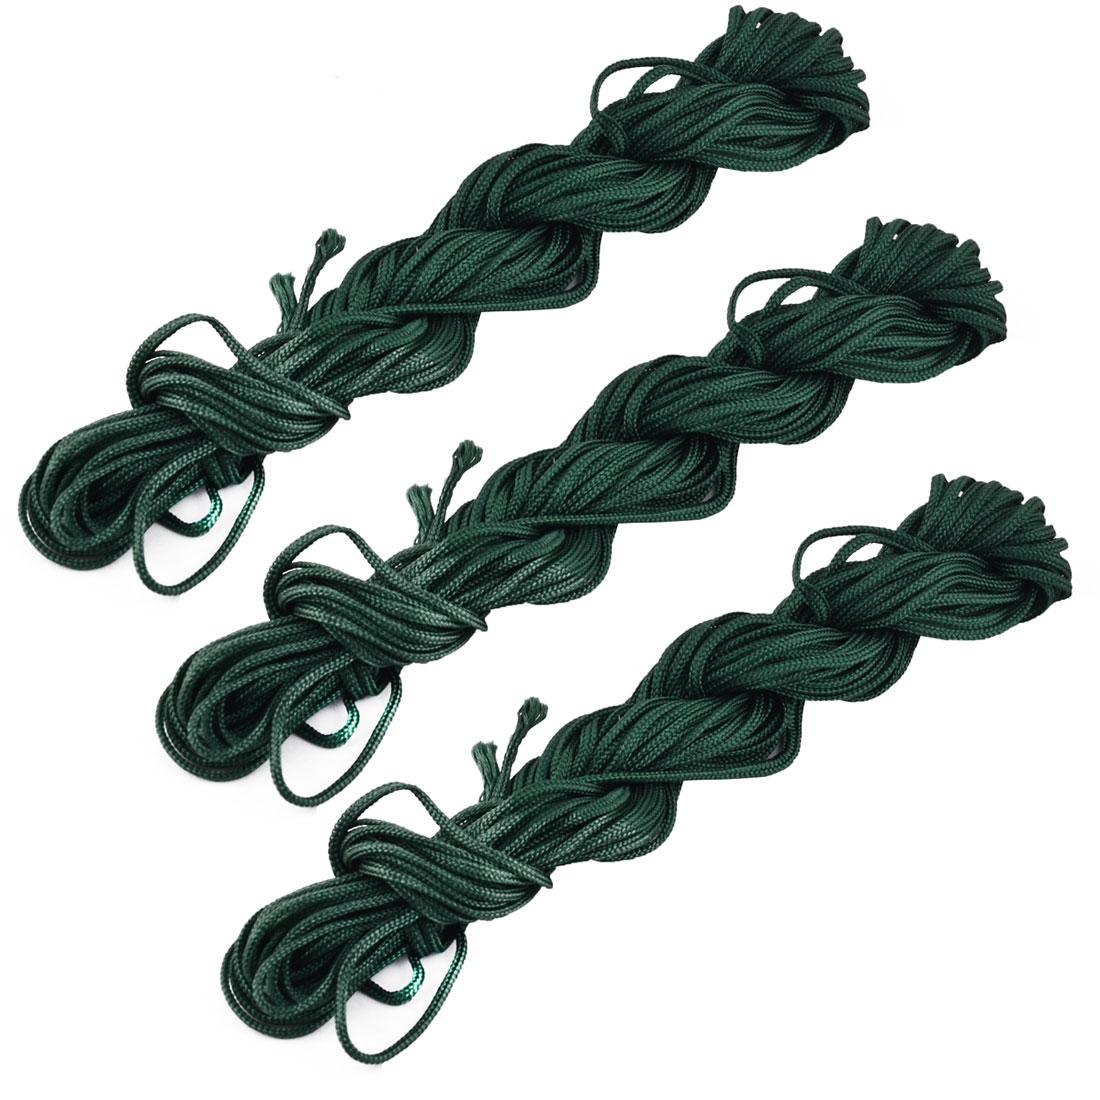 Nylon Craft DIY Chinese Knot Necklace Cord Thread Rope Dark Green 16 Yards 3 Pcs